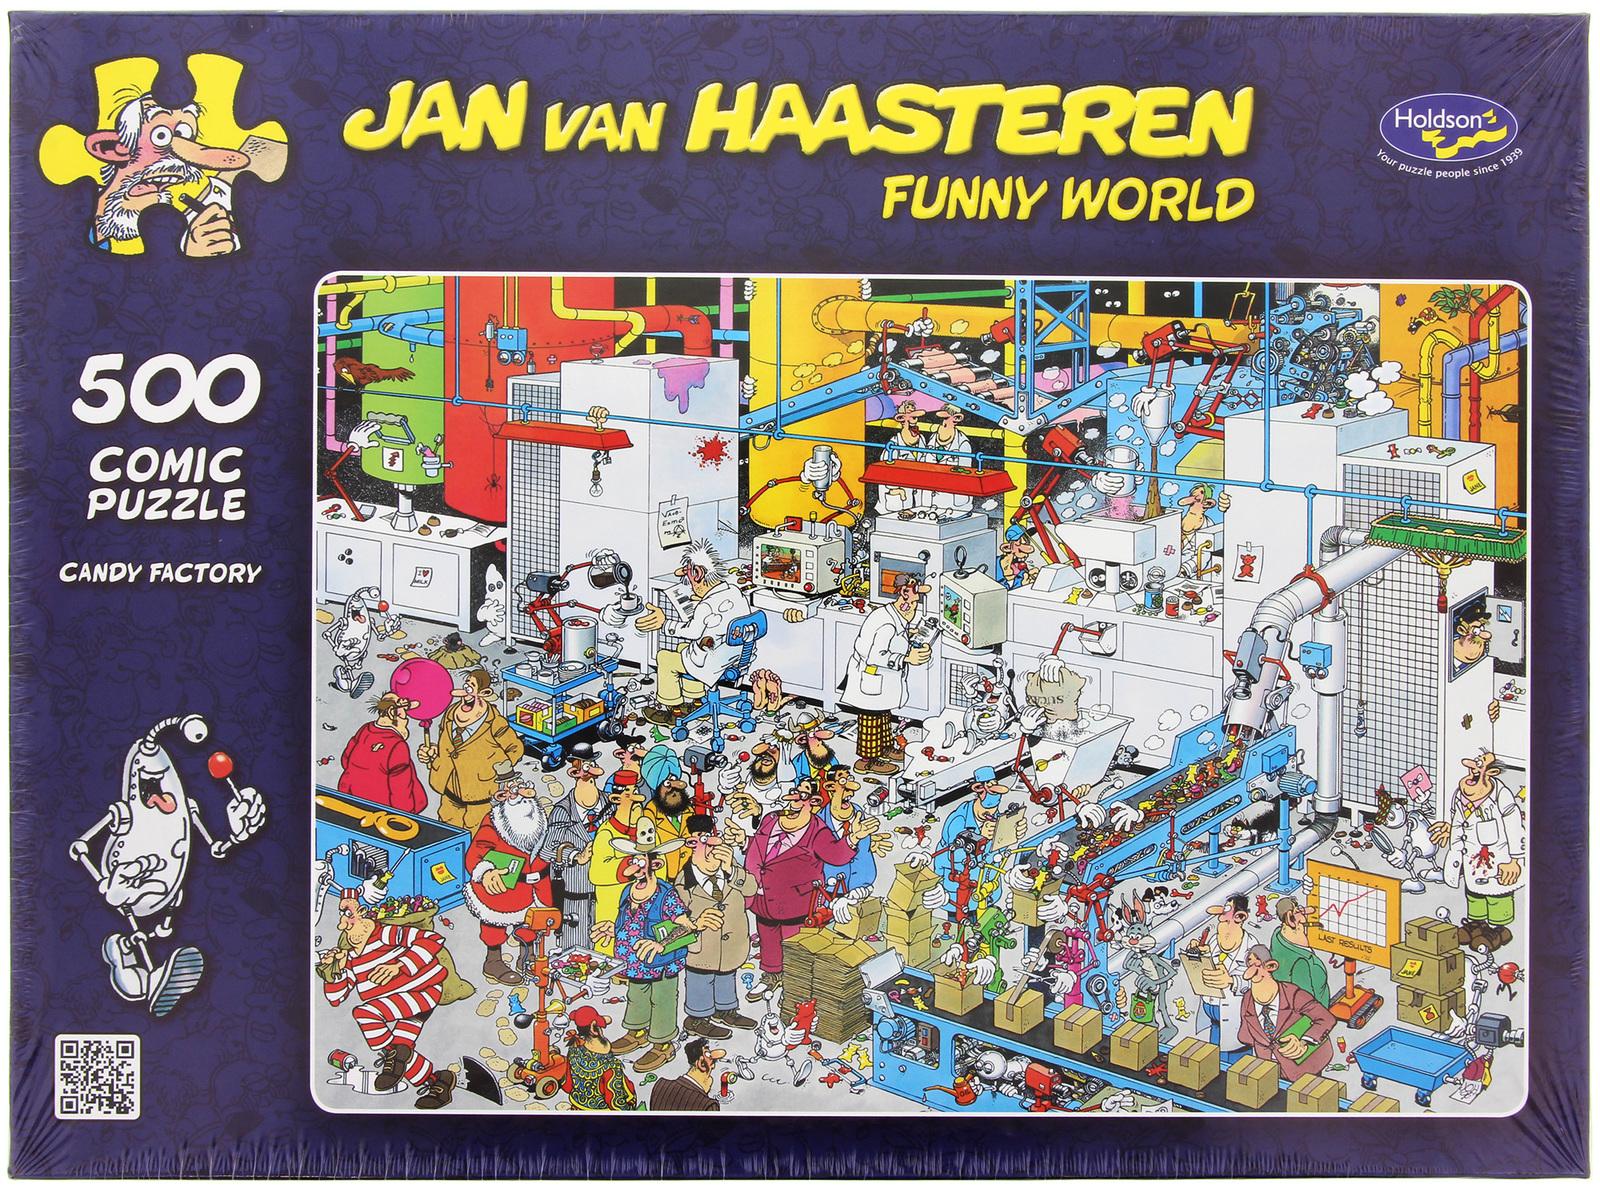 Van Haasteren: 500pc Candy Factory Puzzle image